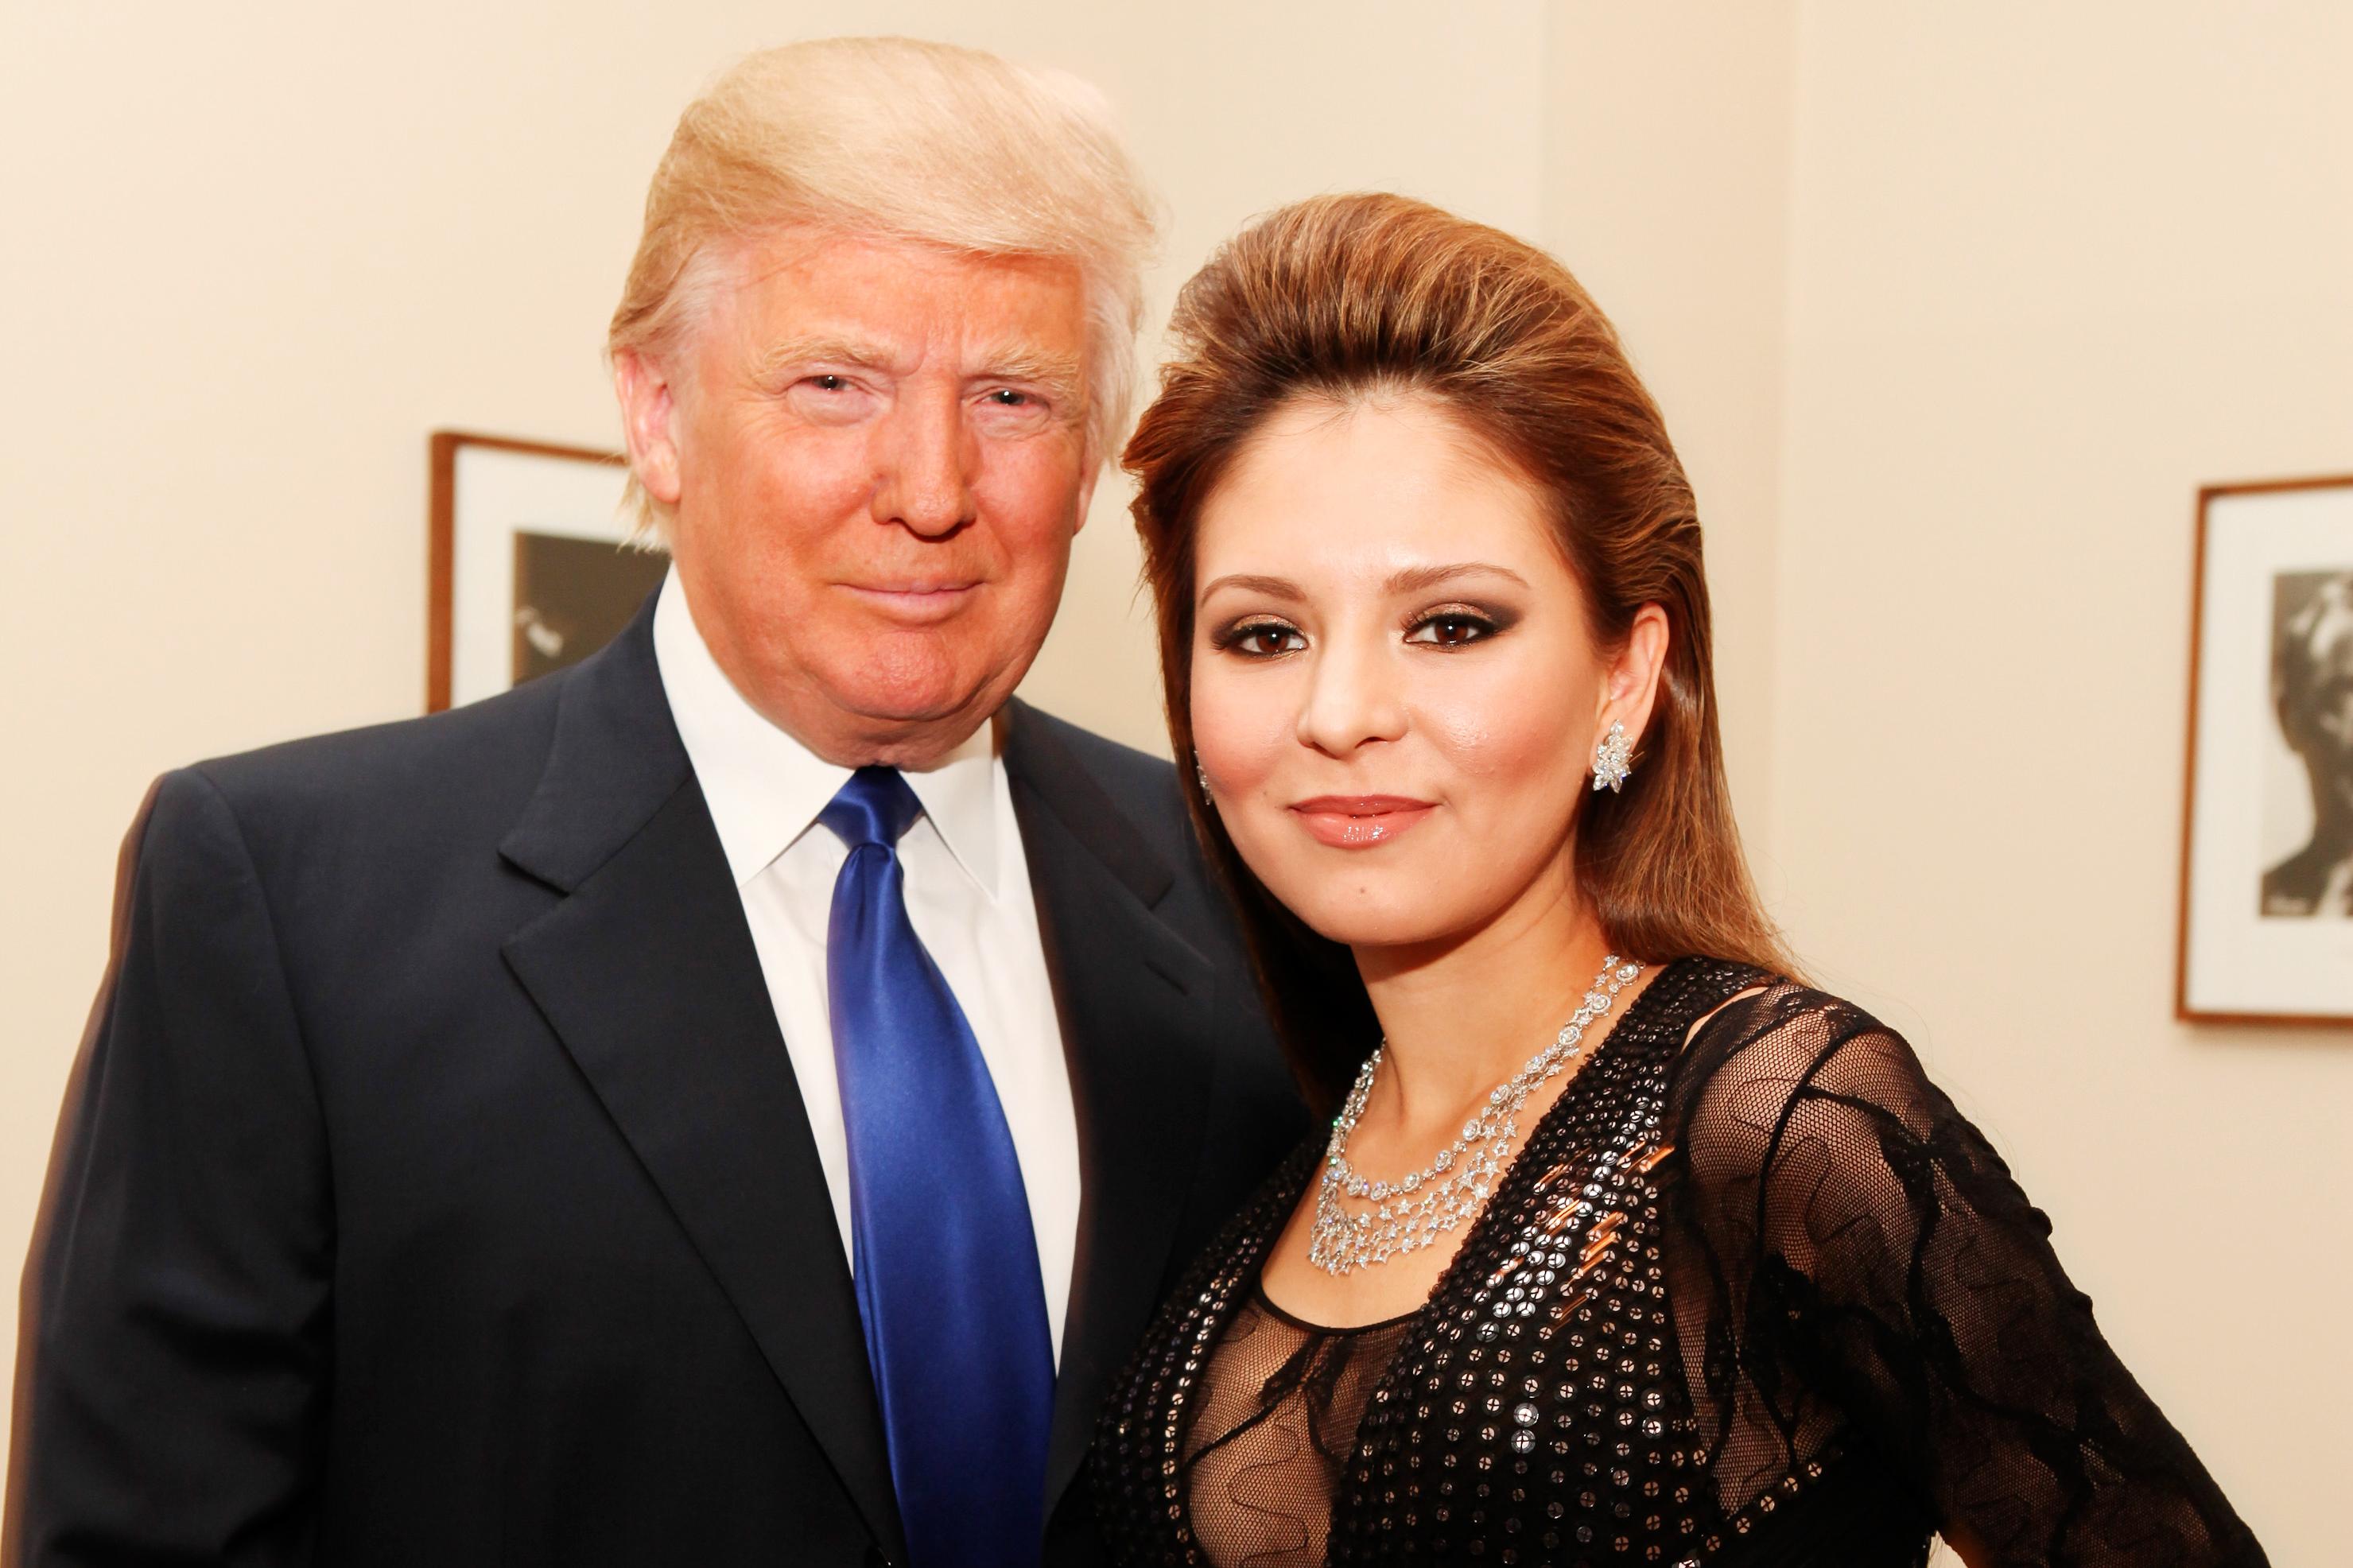 291b2413f64 NEW YORK - JANUARY 19  Donald Trump and pianist Lola Astanova pose  backstage Lola s performance